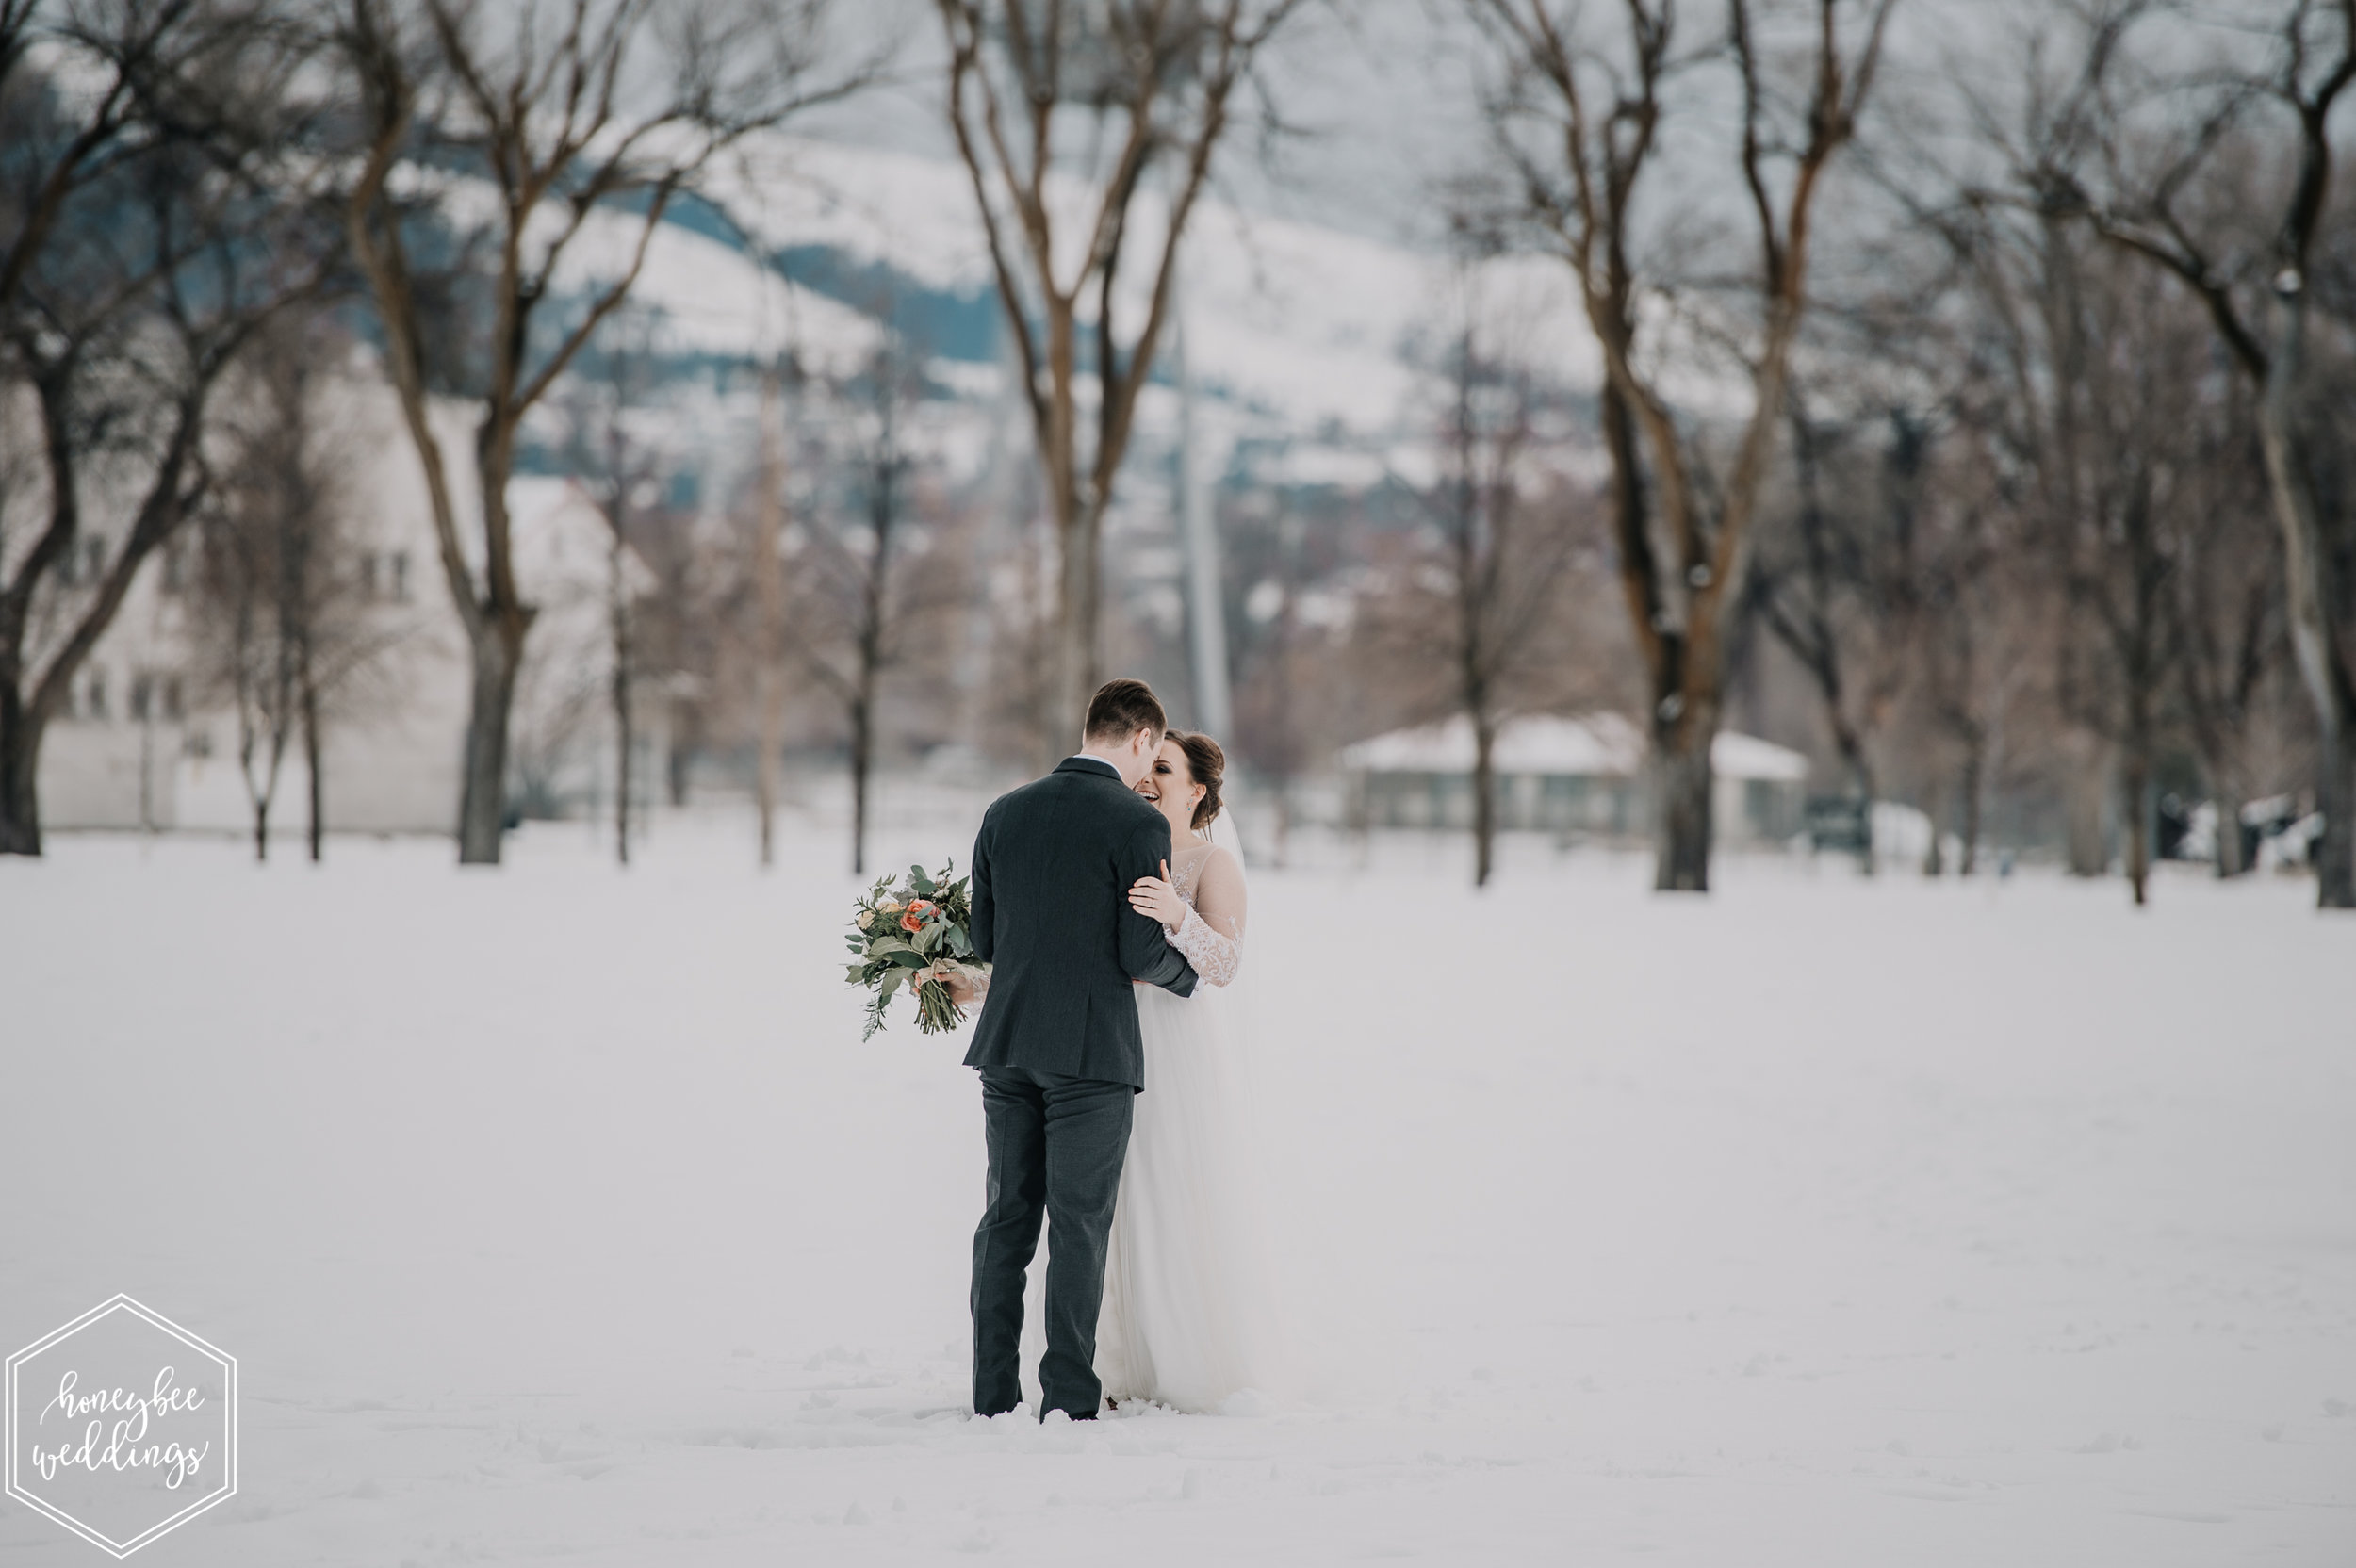 0076Montana Wedding Photographer_Montana winter wedding_Wedding at Fort Missoula_Meri & Carter_January 19, 2019-176.jpg